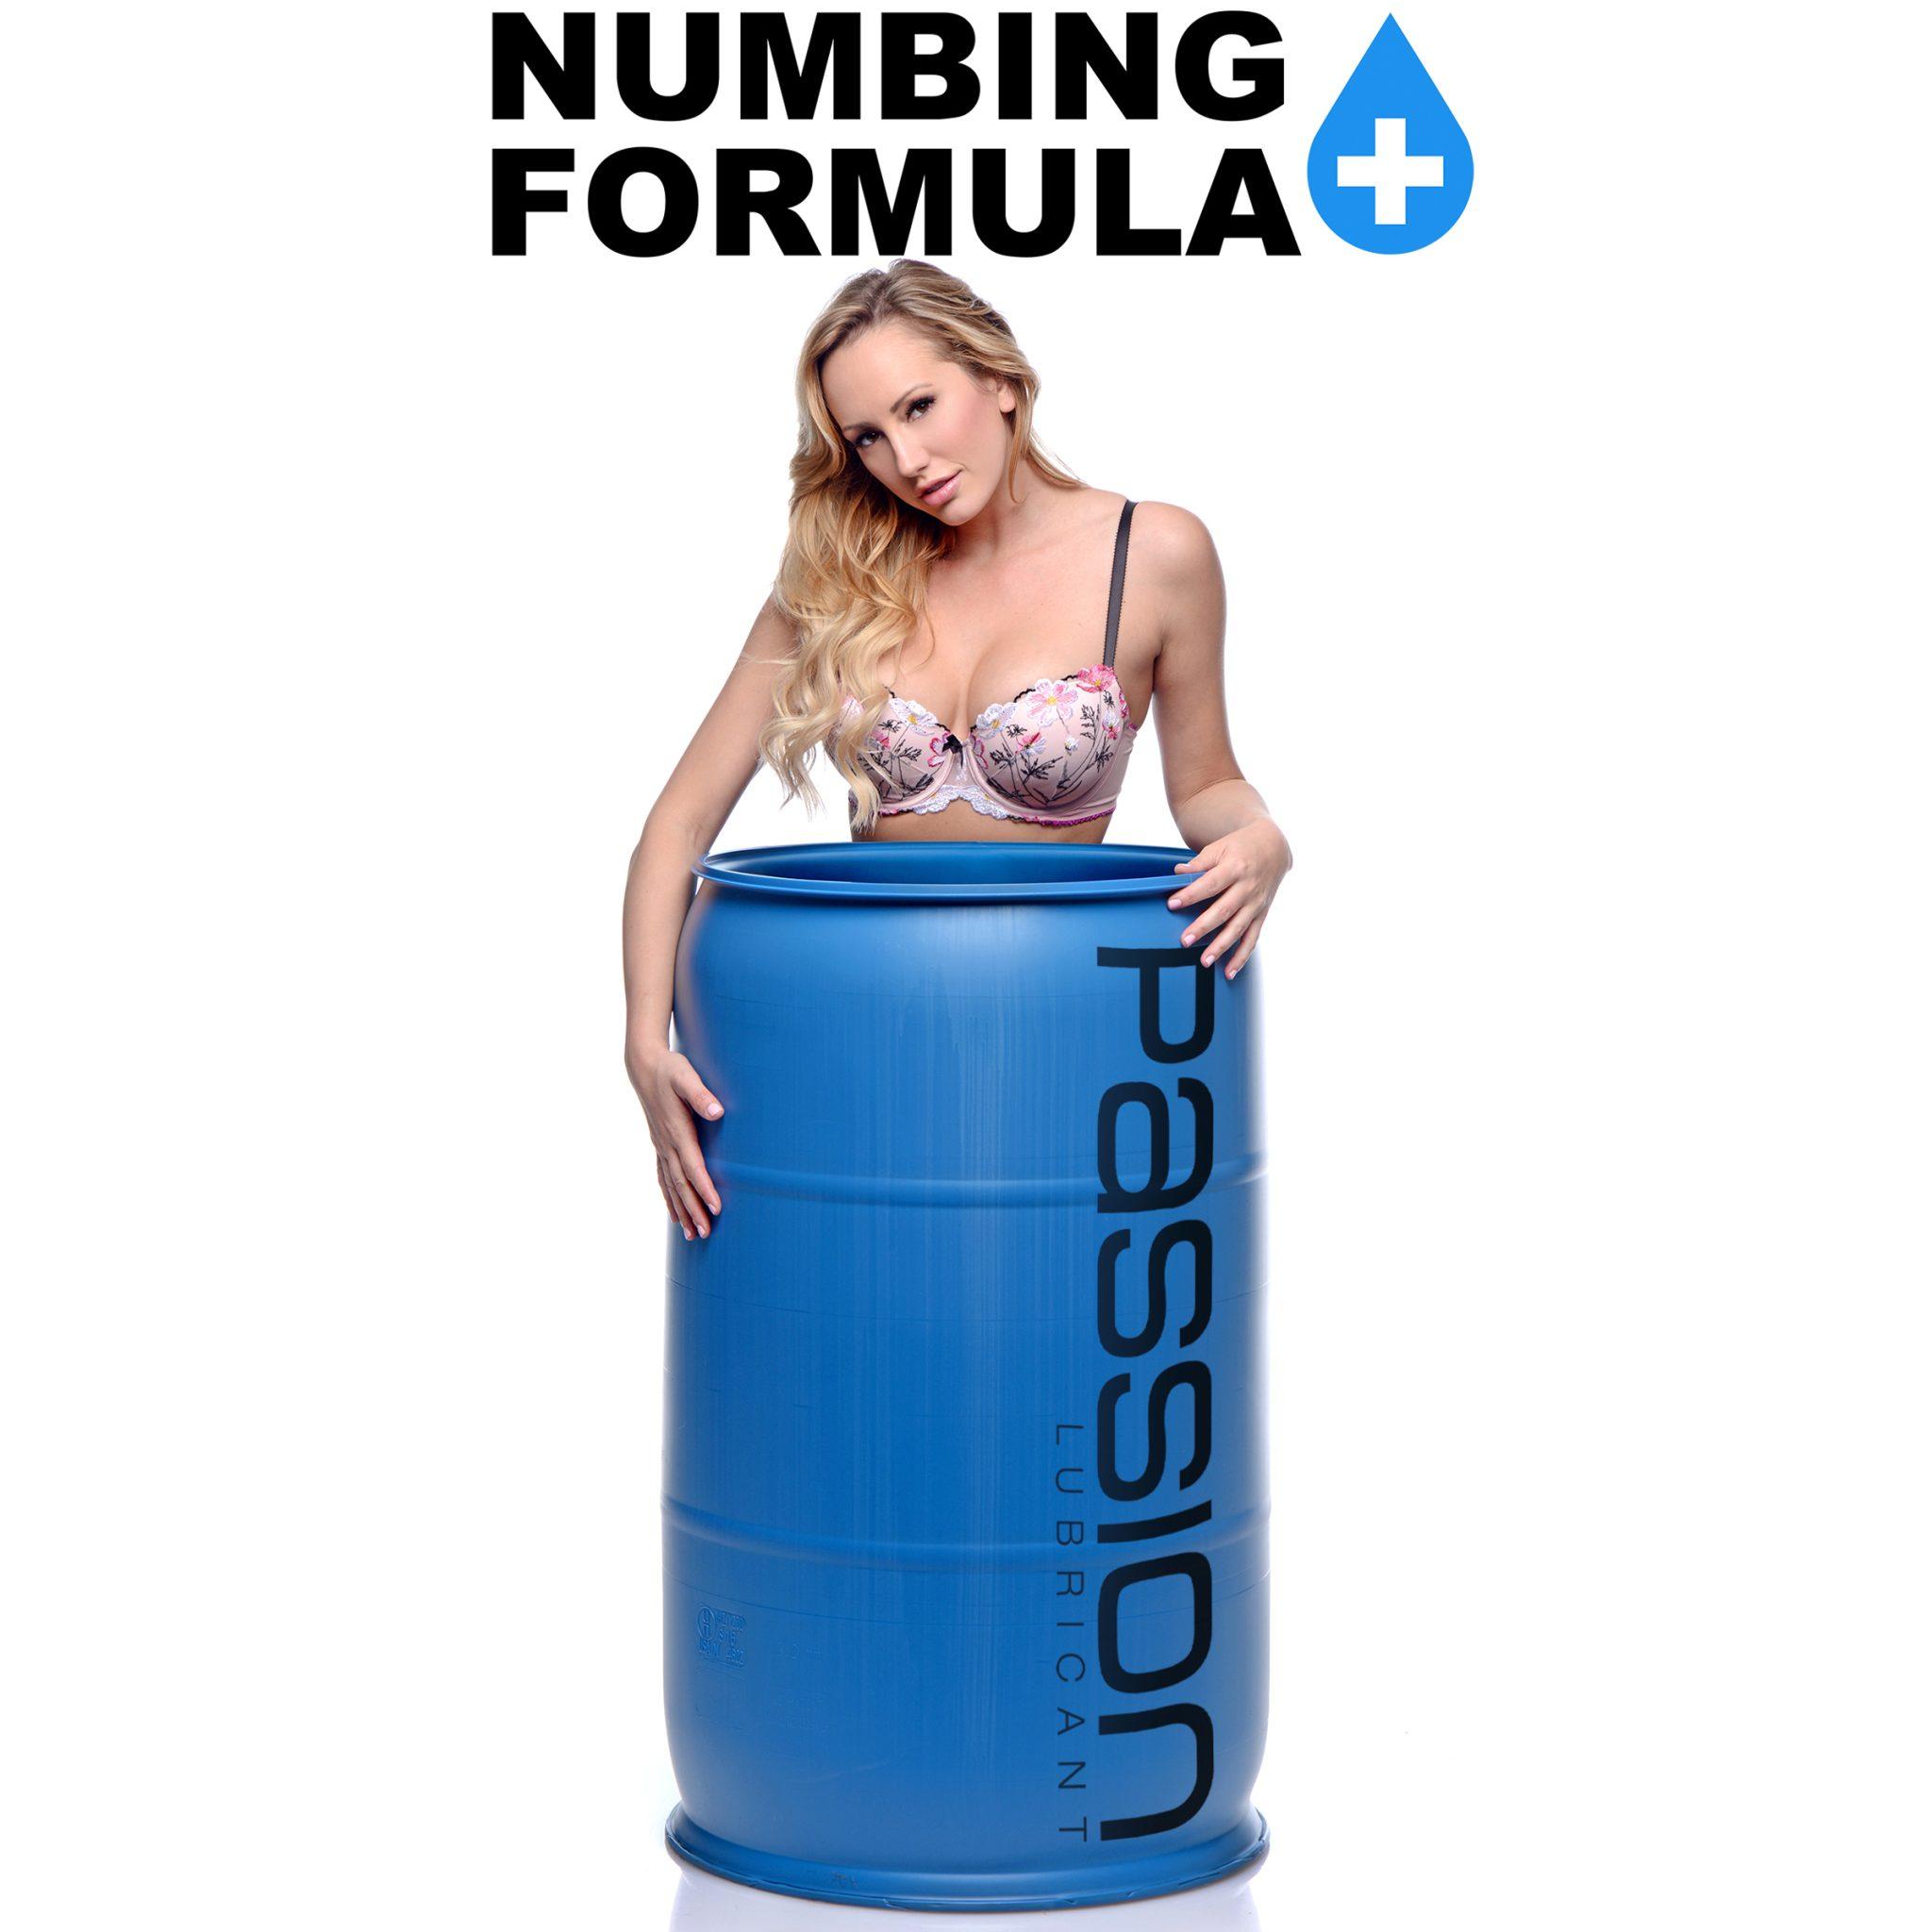 Passion Desensitizing Lube – 55 Gallon Drum